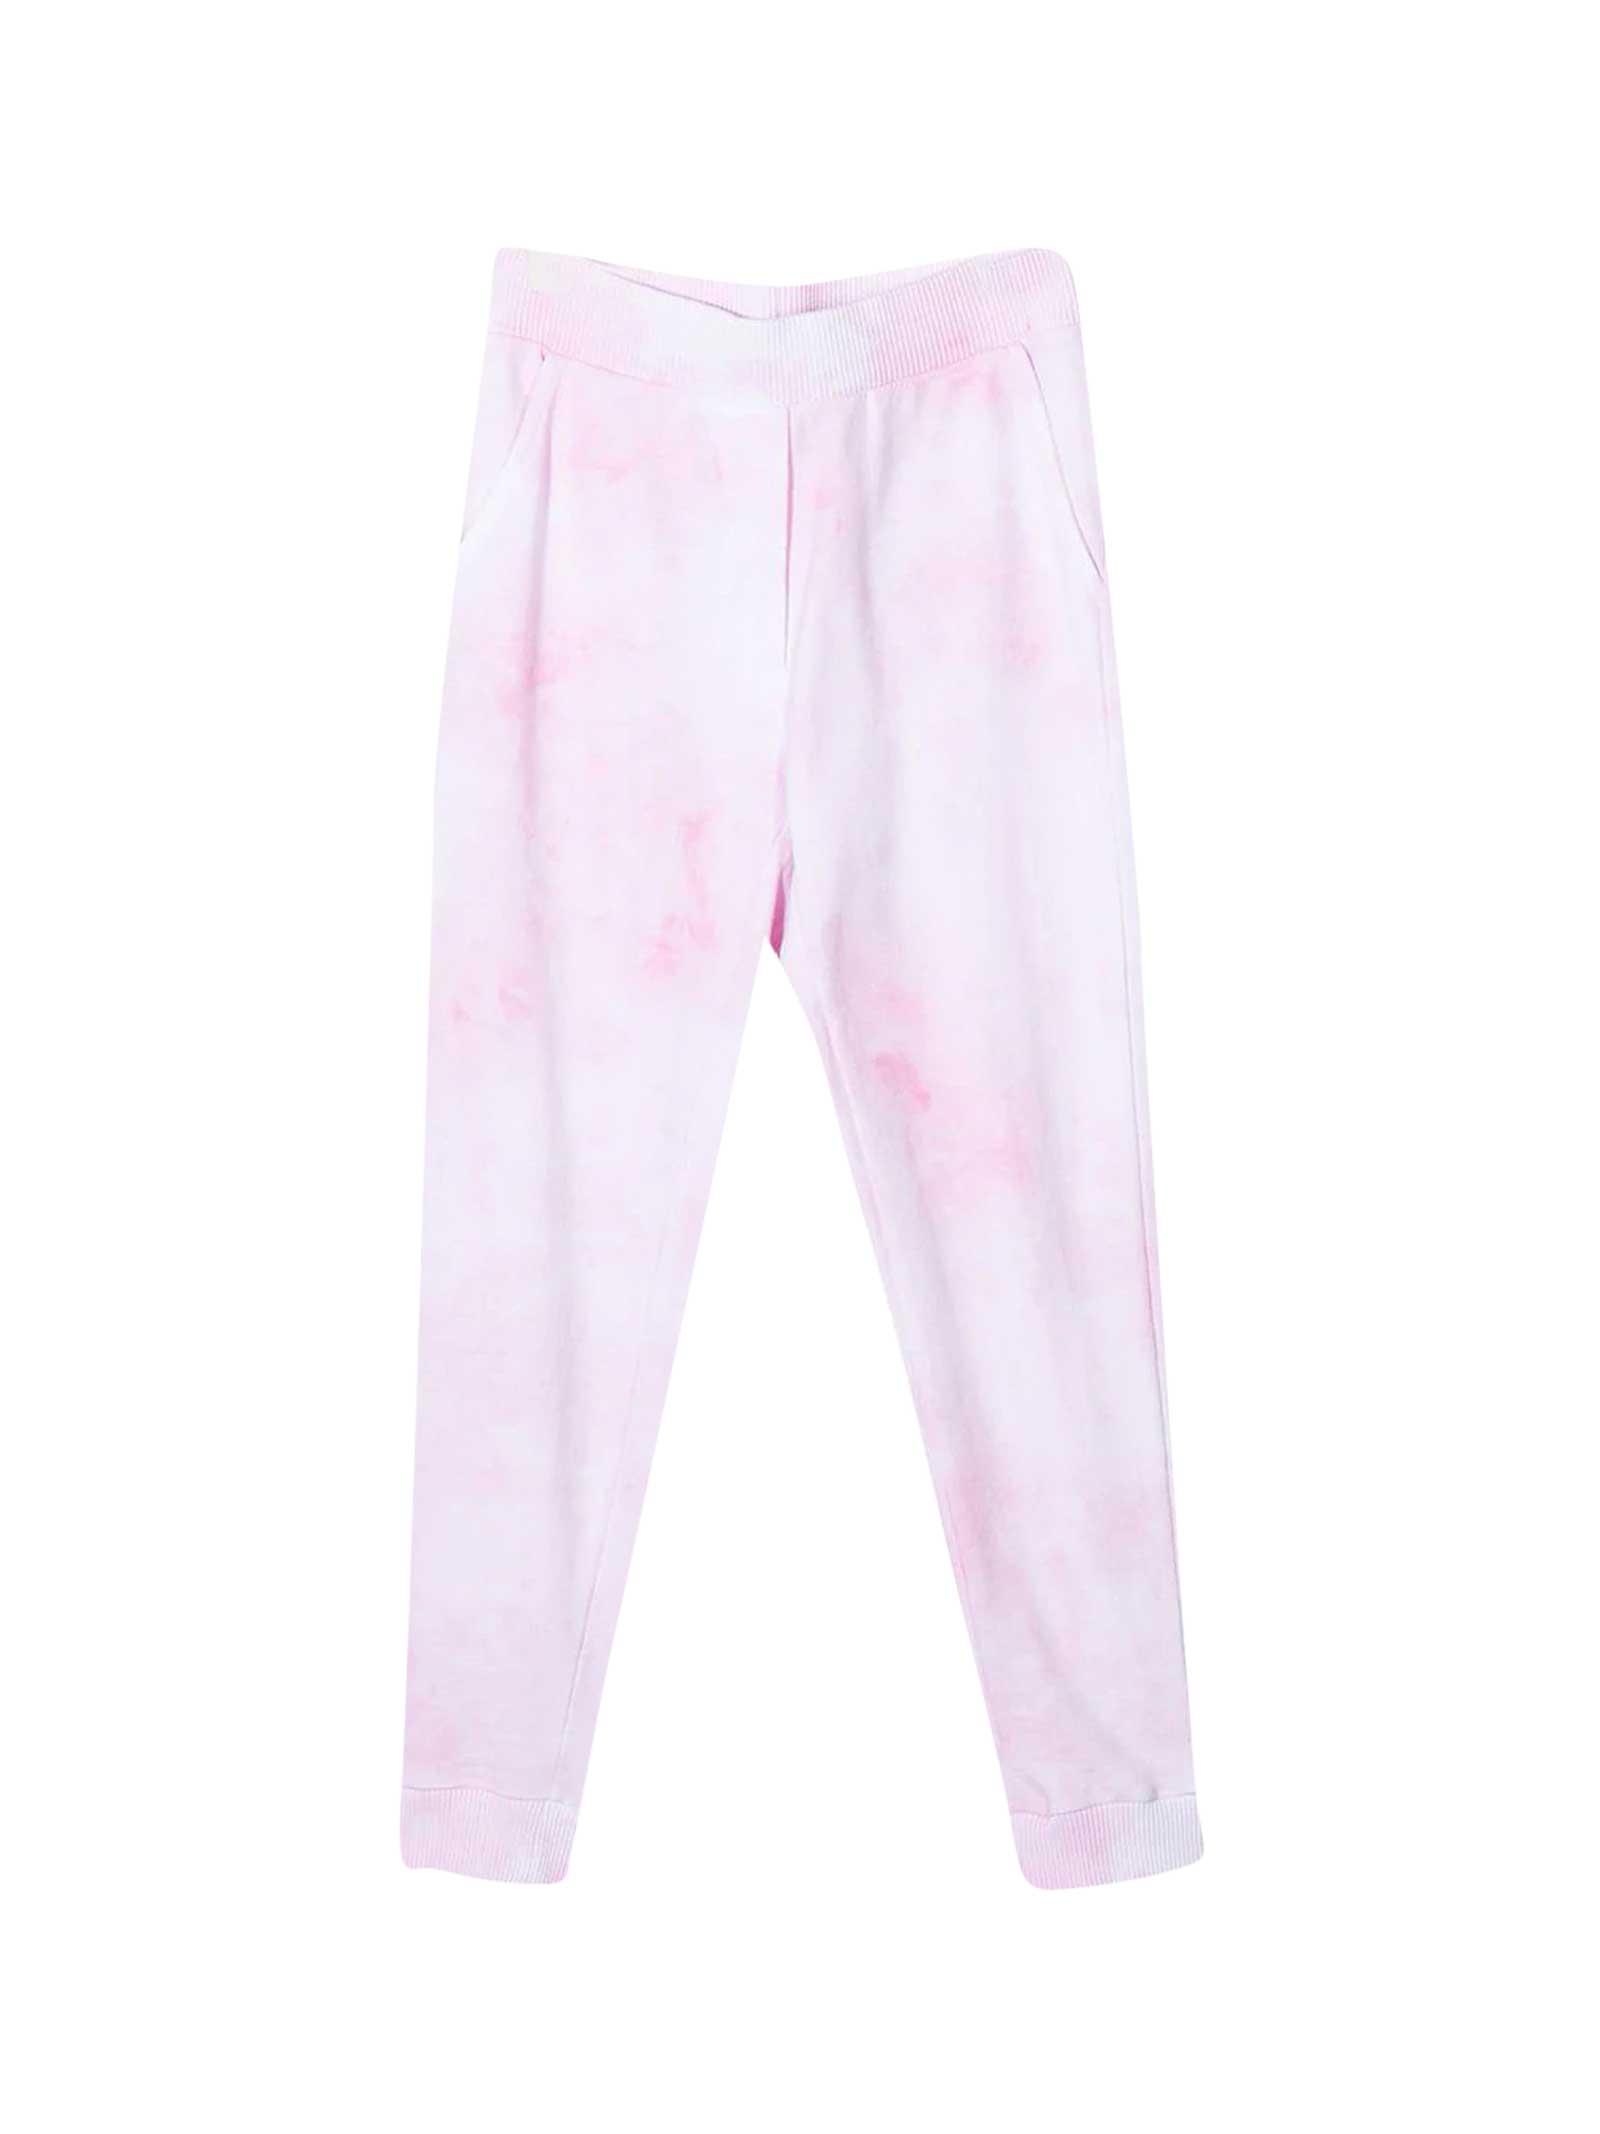 Pantaloni Sportivi Con Fantasia Tie Dye